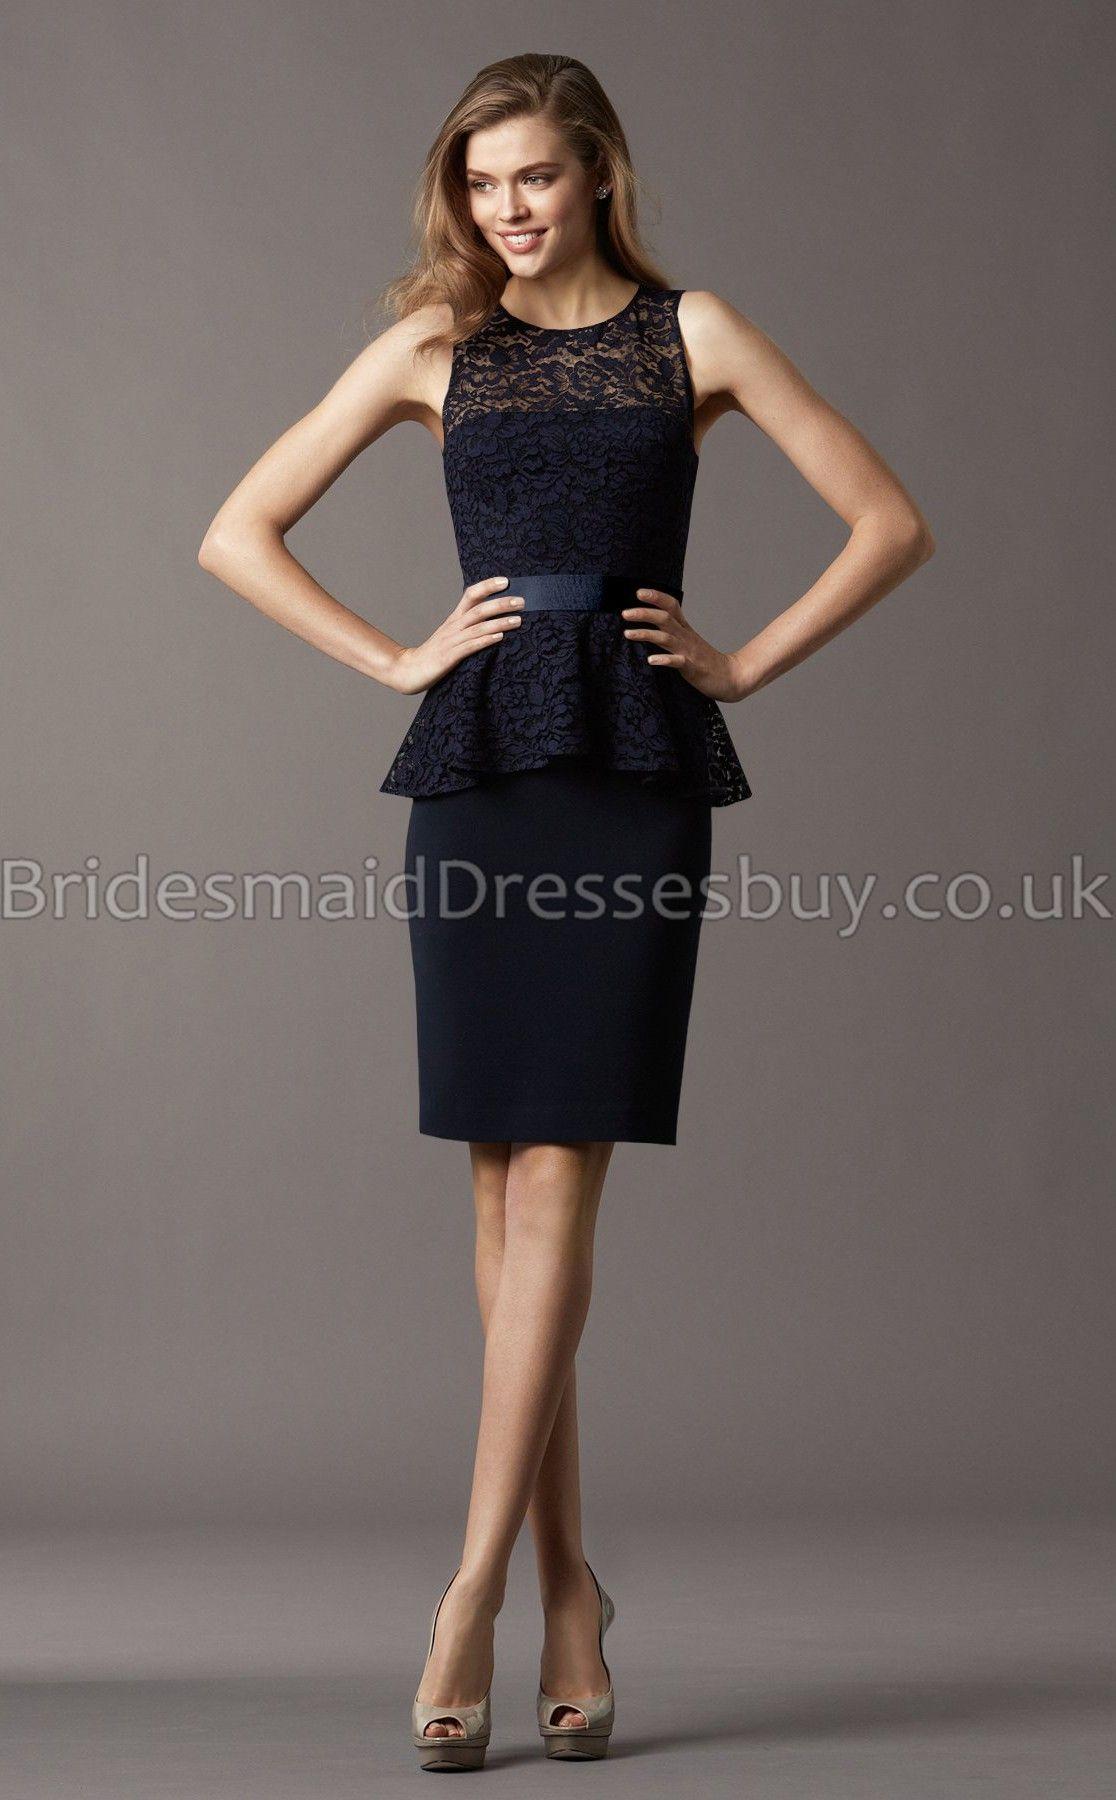 1000  images about Black Bridesmaids gowns on Pinterest - Black ...